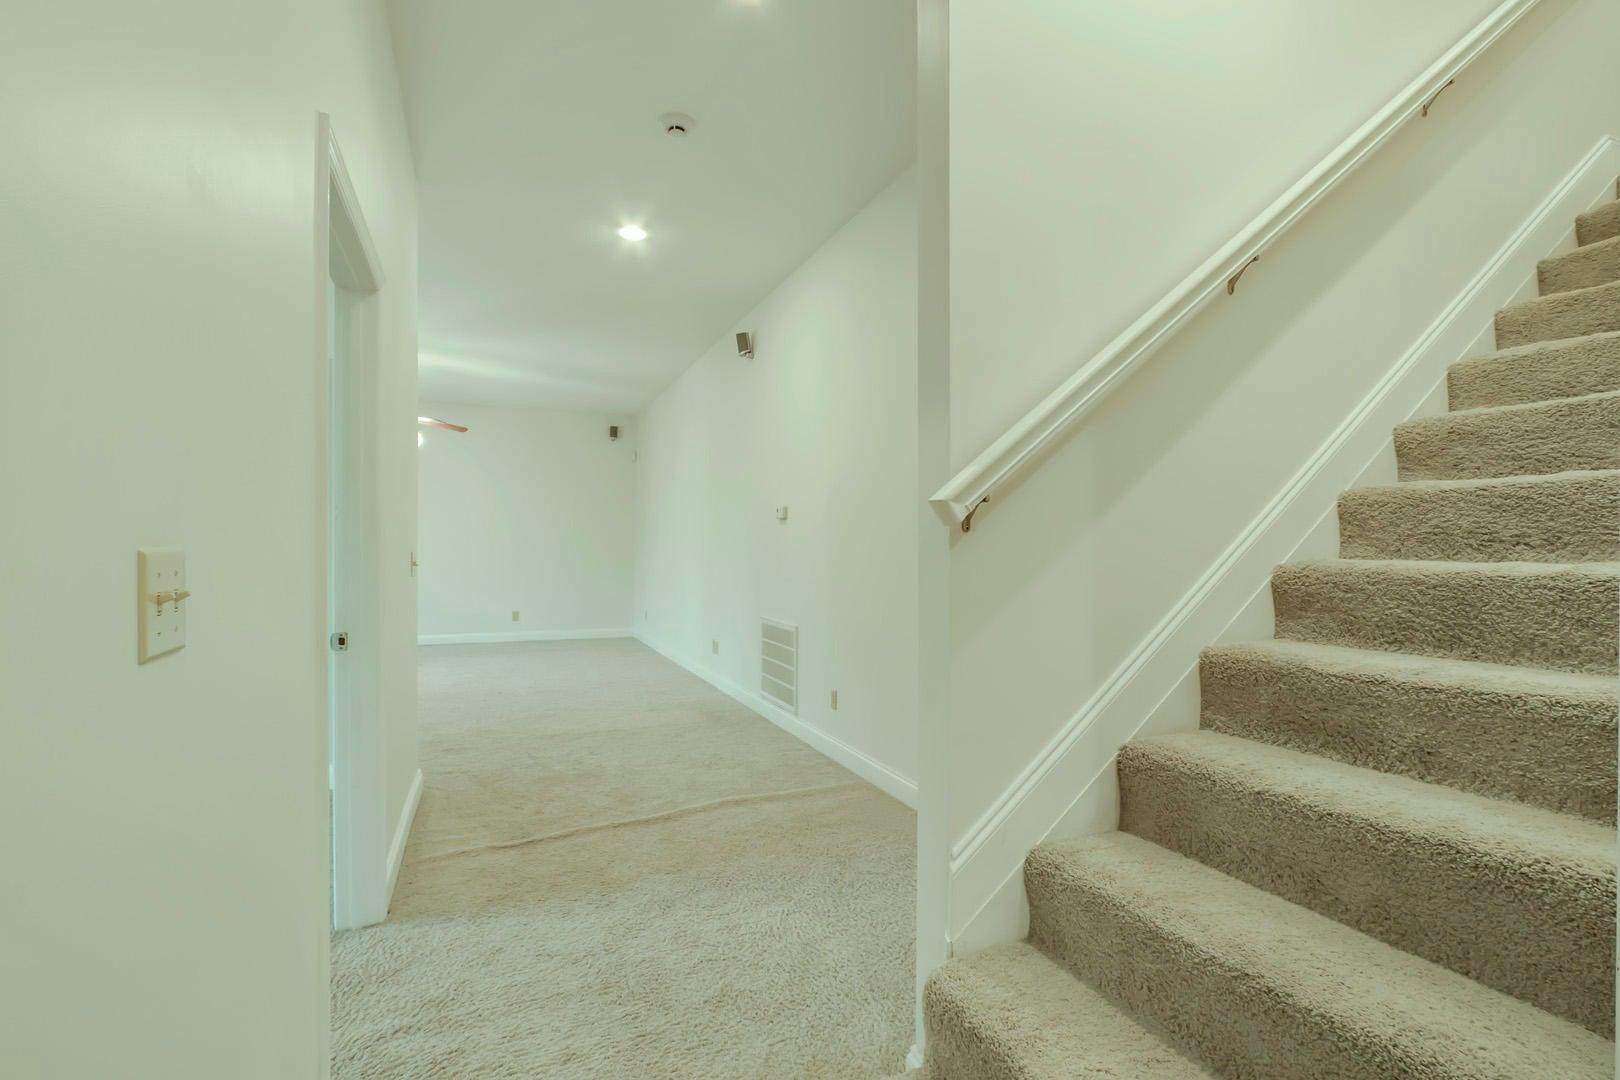 31_TanasiLane_601_StairsUp